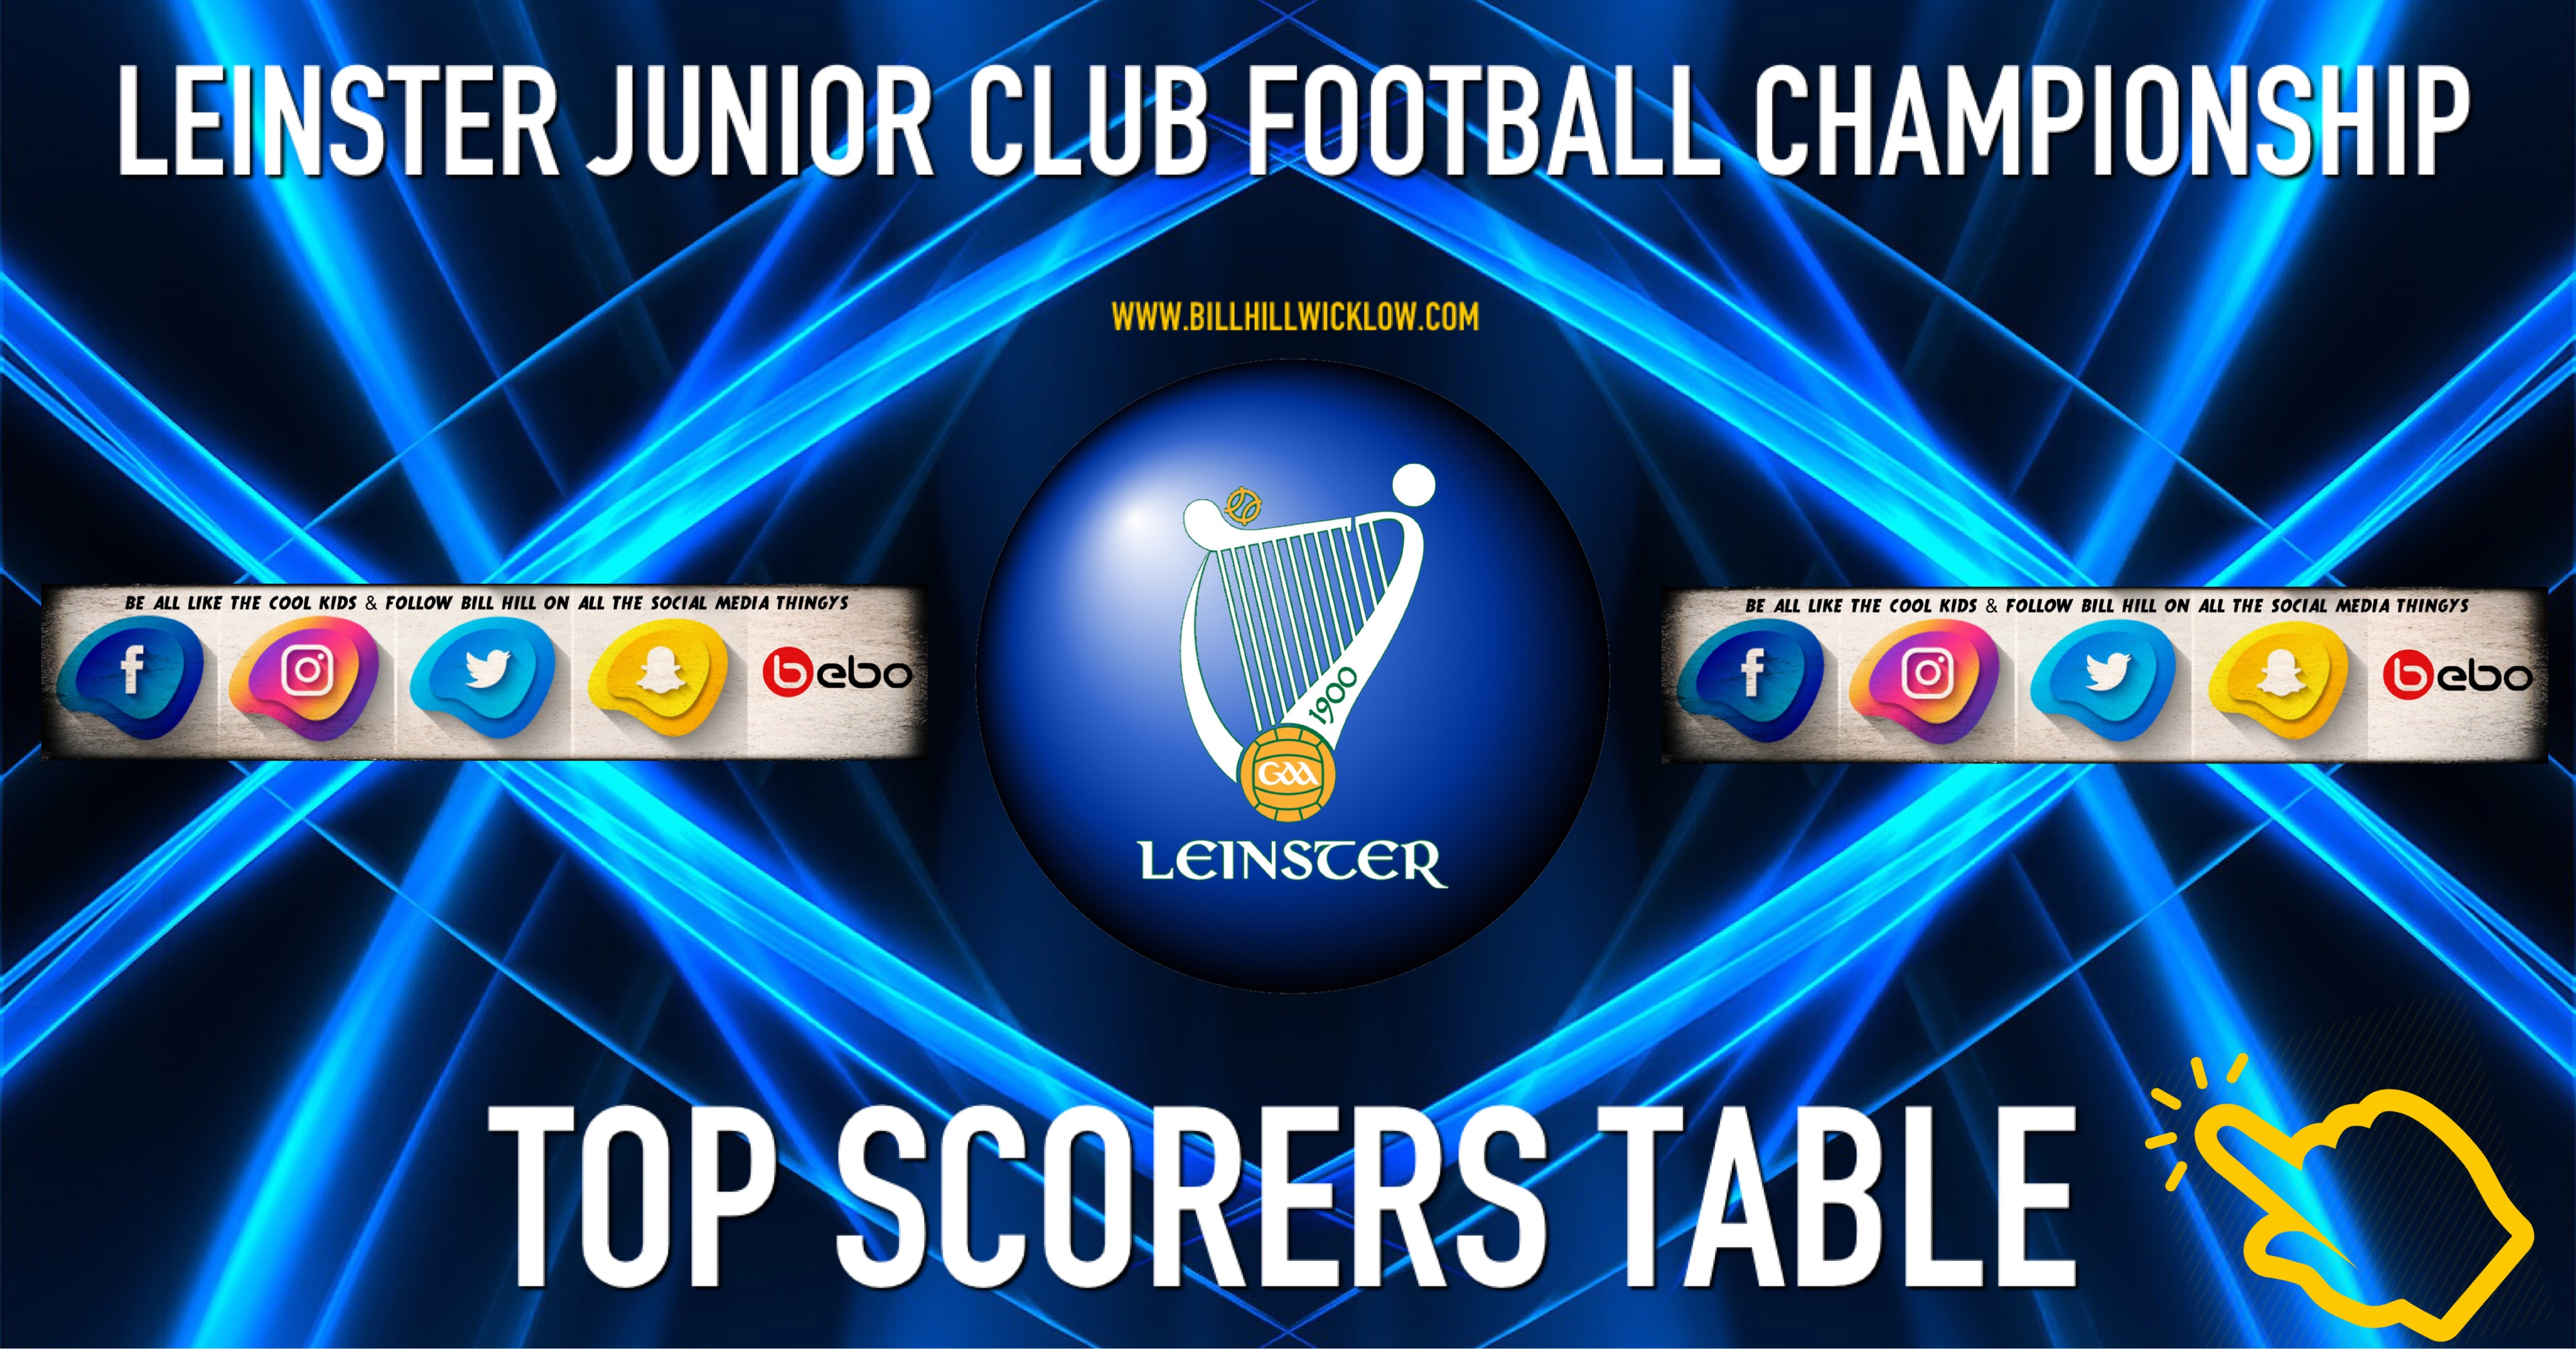 Leinster Junior Club Football Championship Top Scorer Table 2019